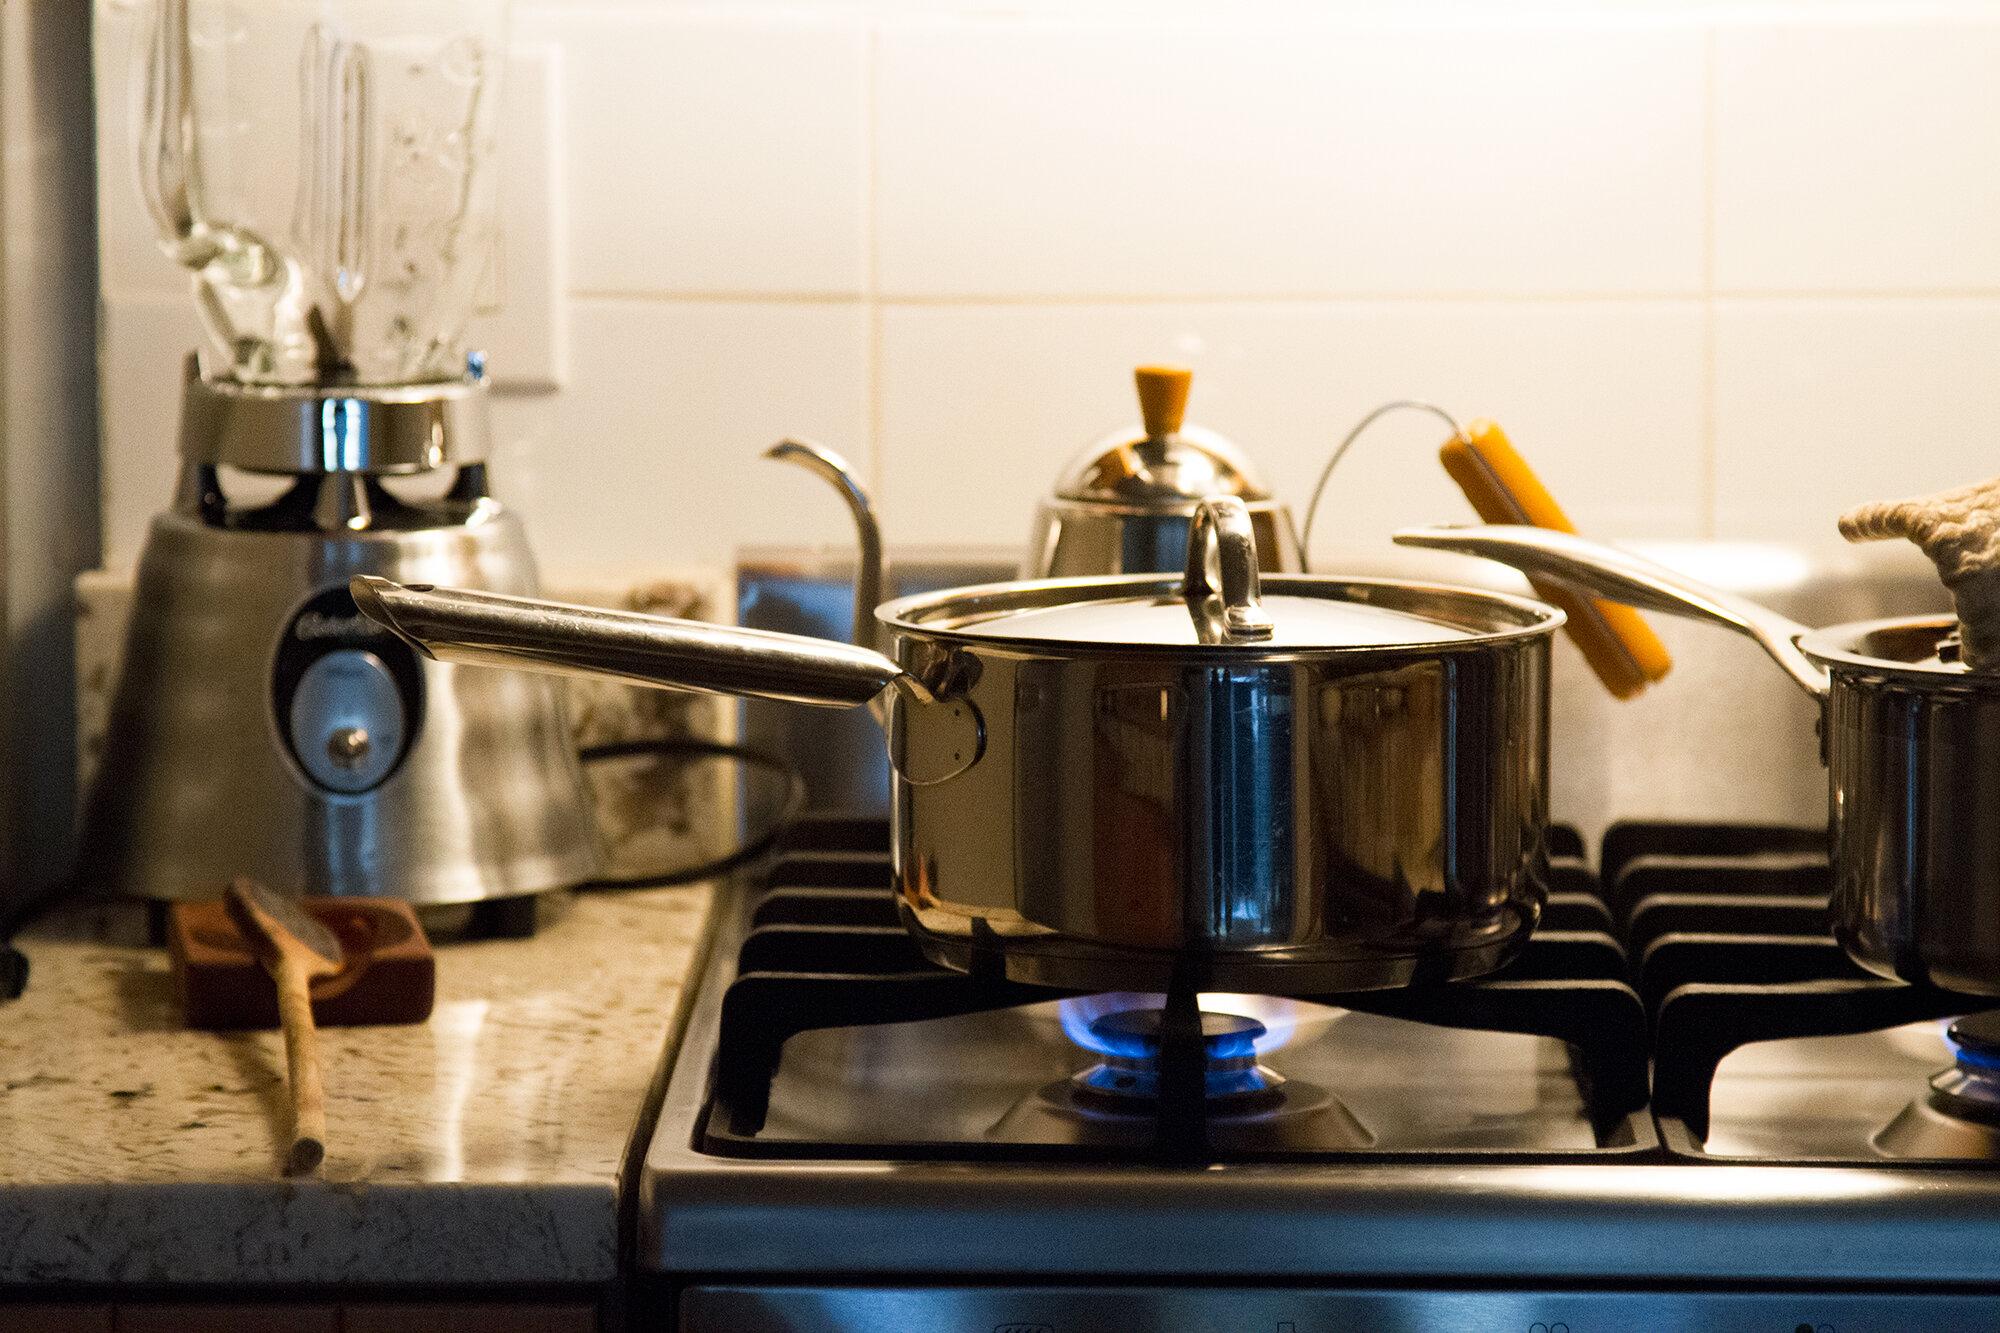 pots | reading my tea leaves